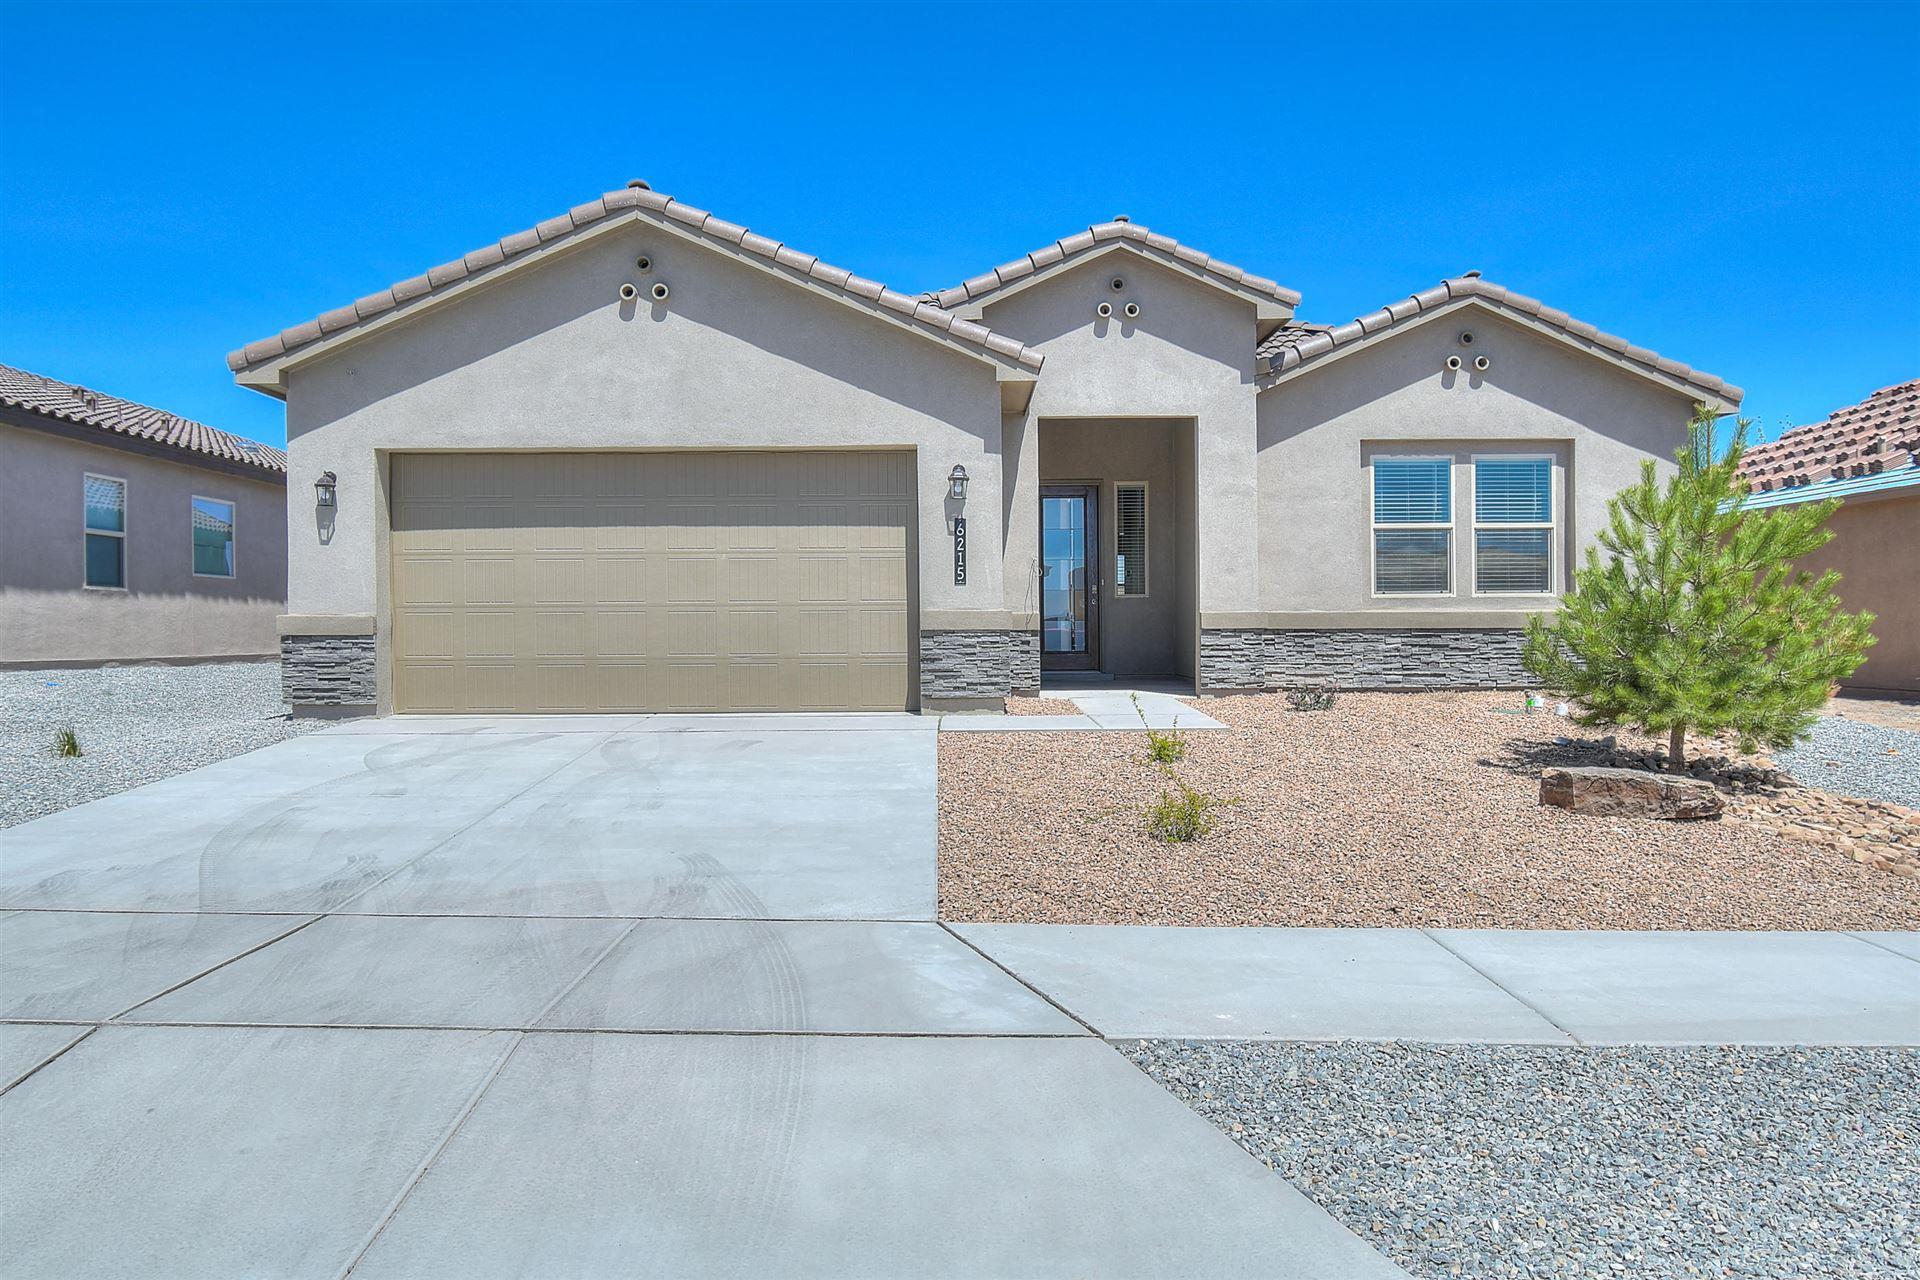 6211 REDROOT Street NW, Albuquerque, NM 87120 - #: 984923